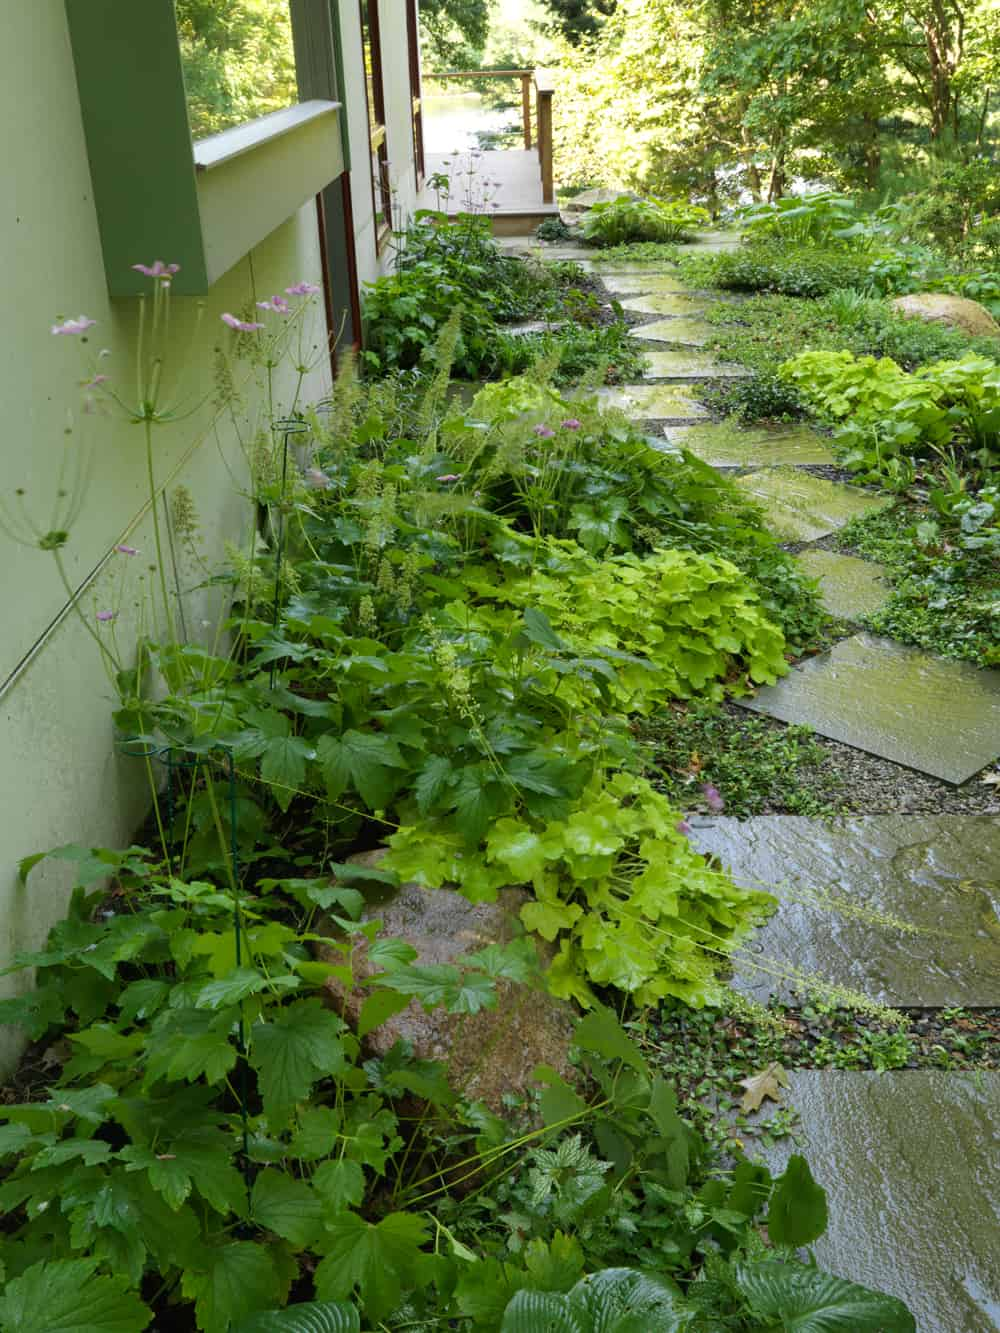 Julie moir messervy design studio boston area woodland garden for Woodland garden design